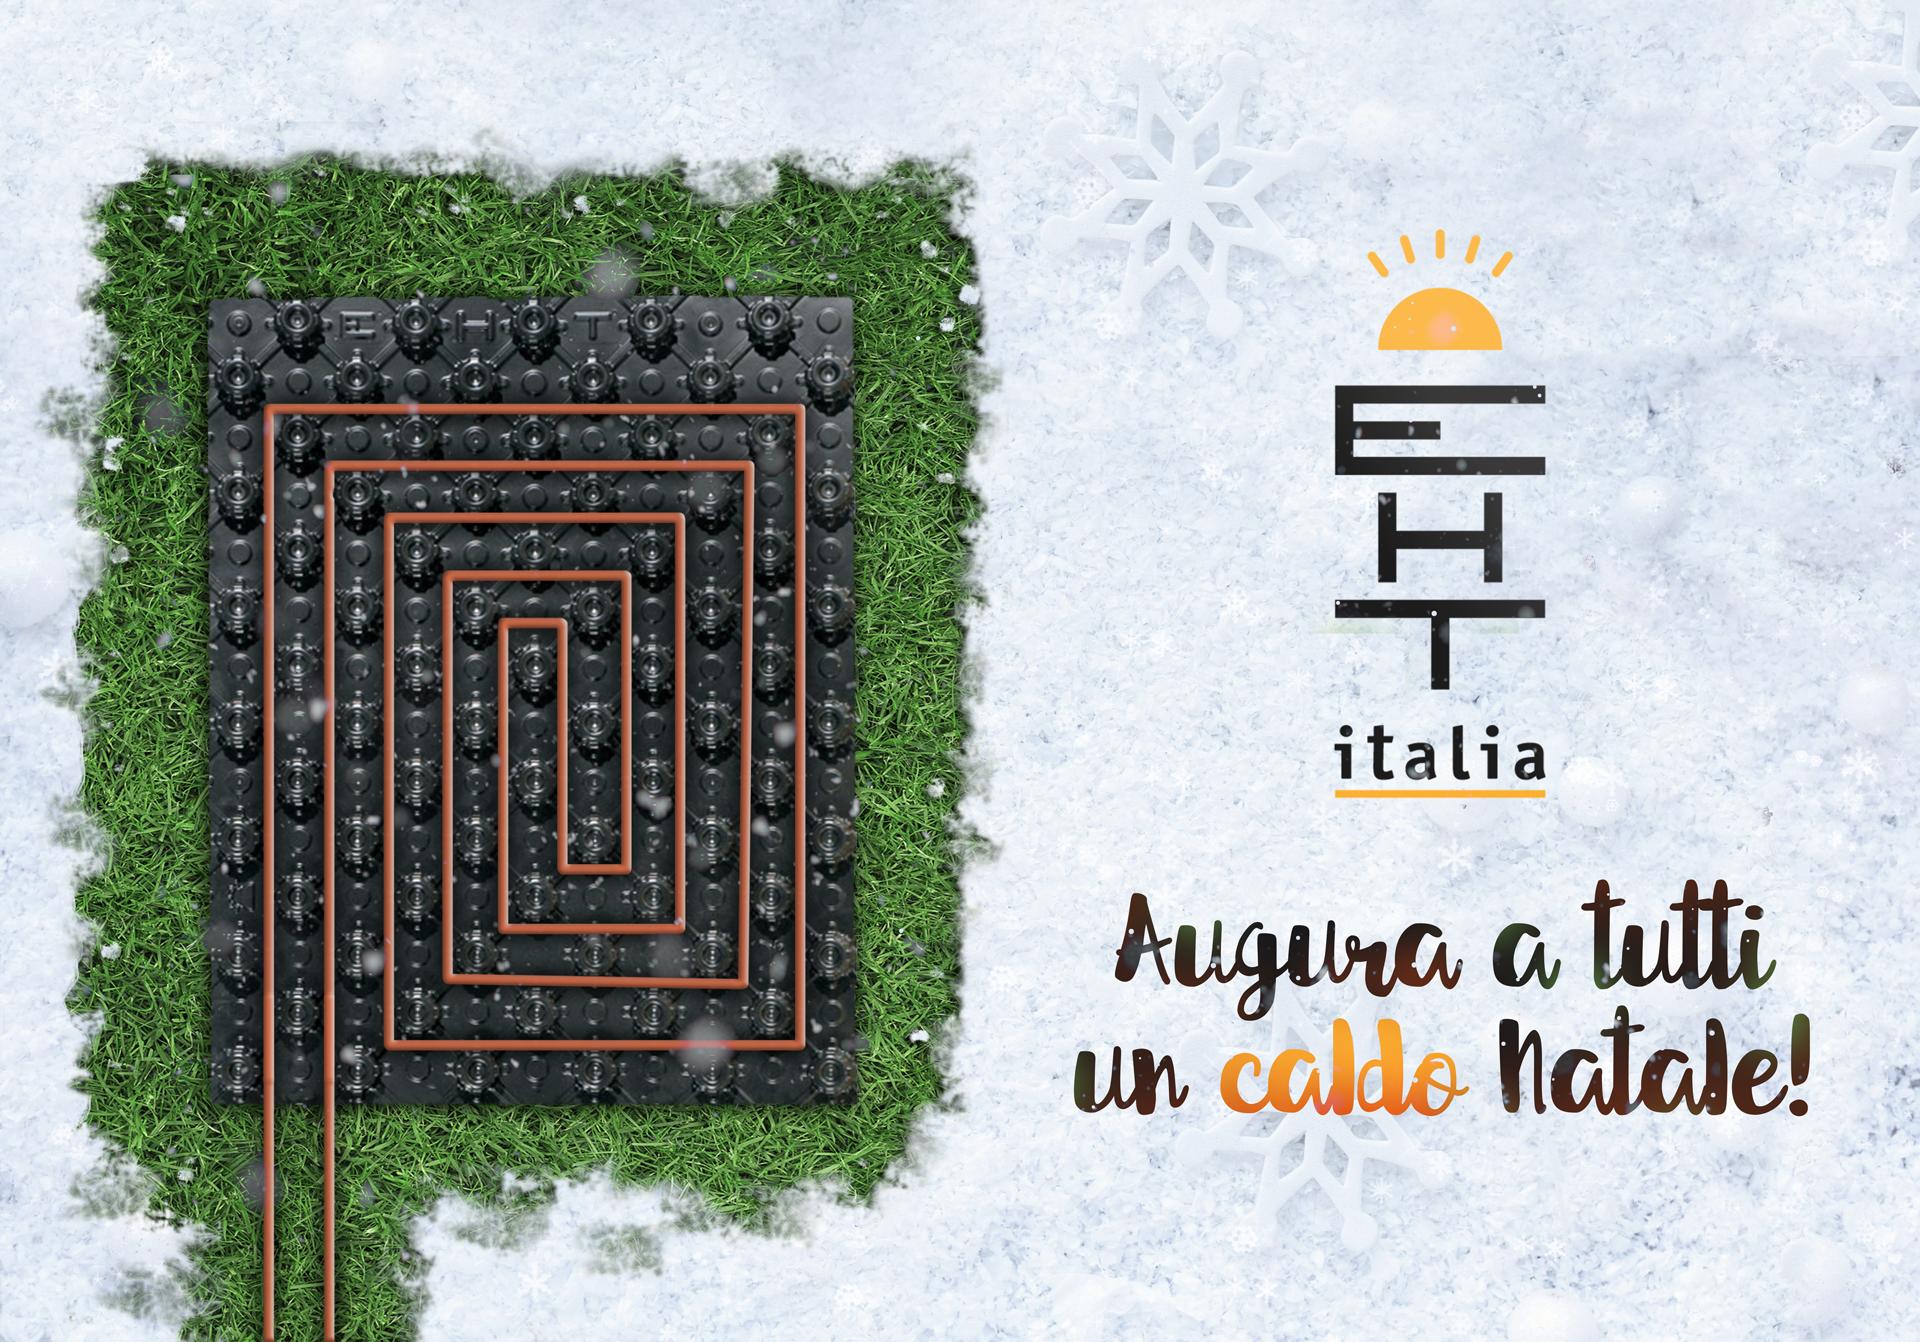 Buon Natale Da EHT Italia!